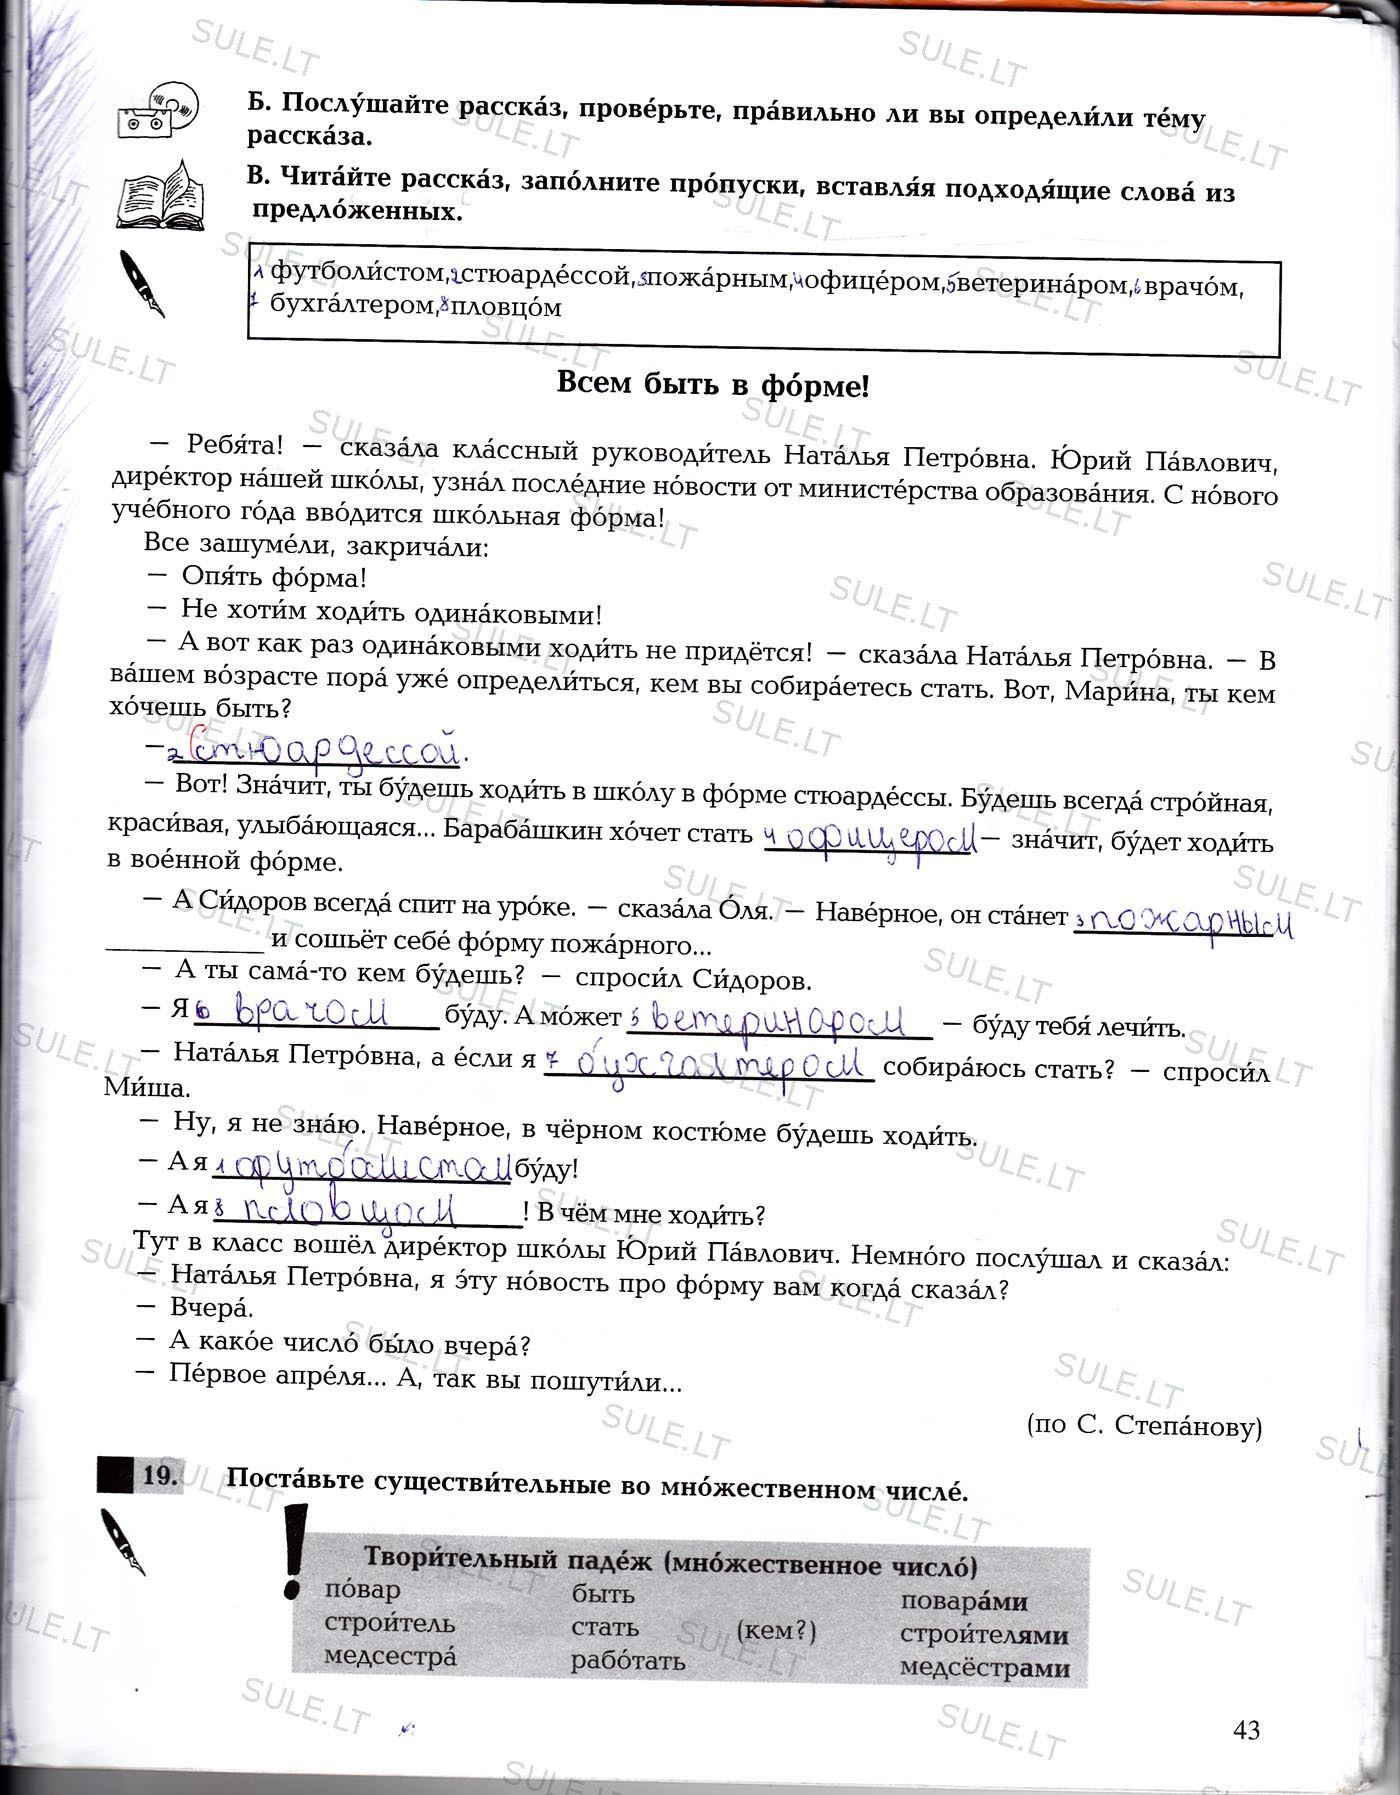 Rusų kalba ŠAG ZA ŠAGOM 2